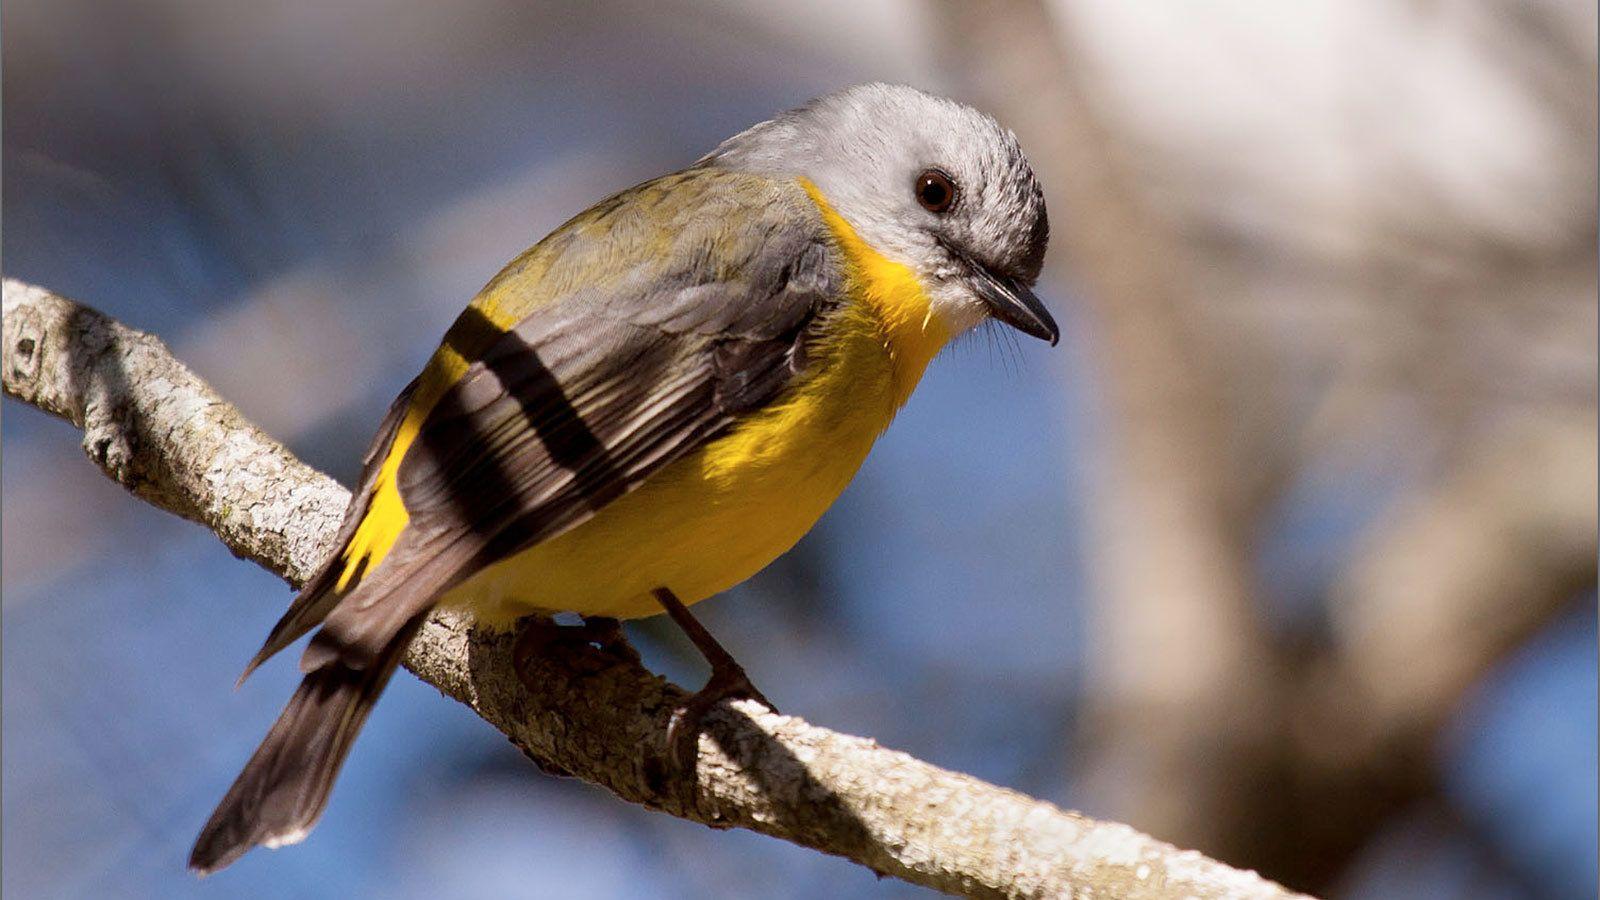 Cute bird on the Noosa Everglades in Costa Rica